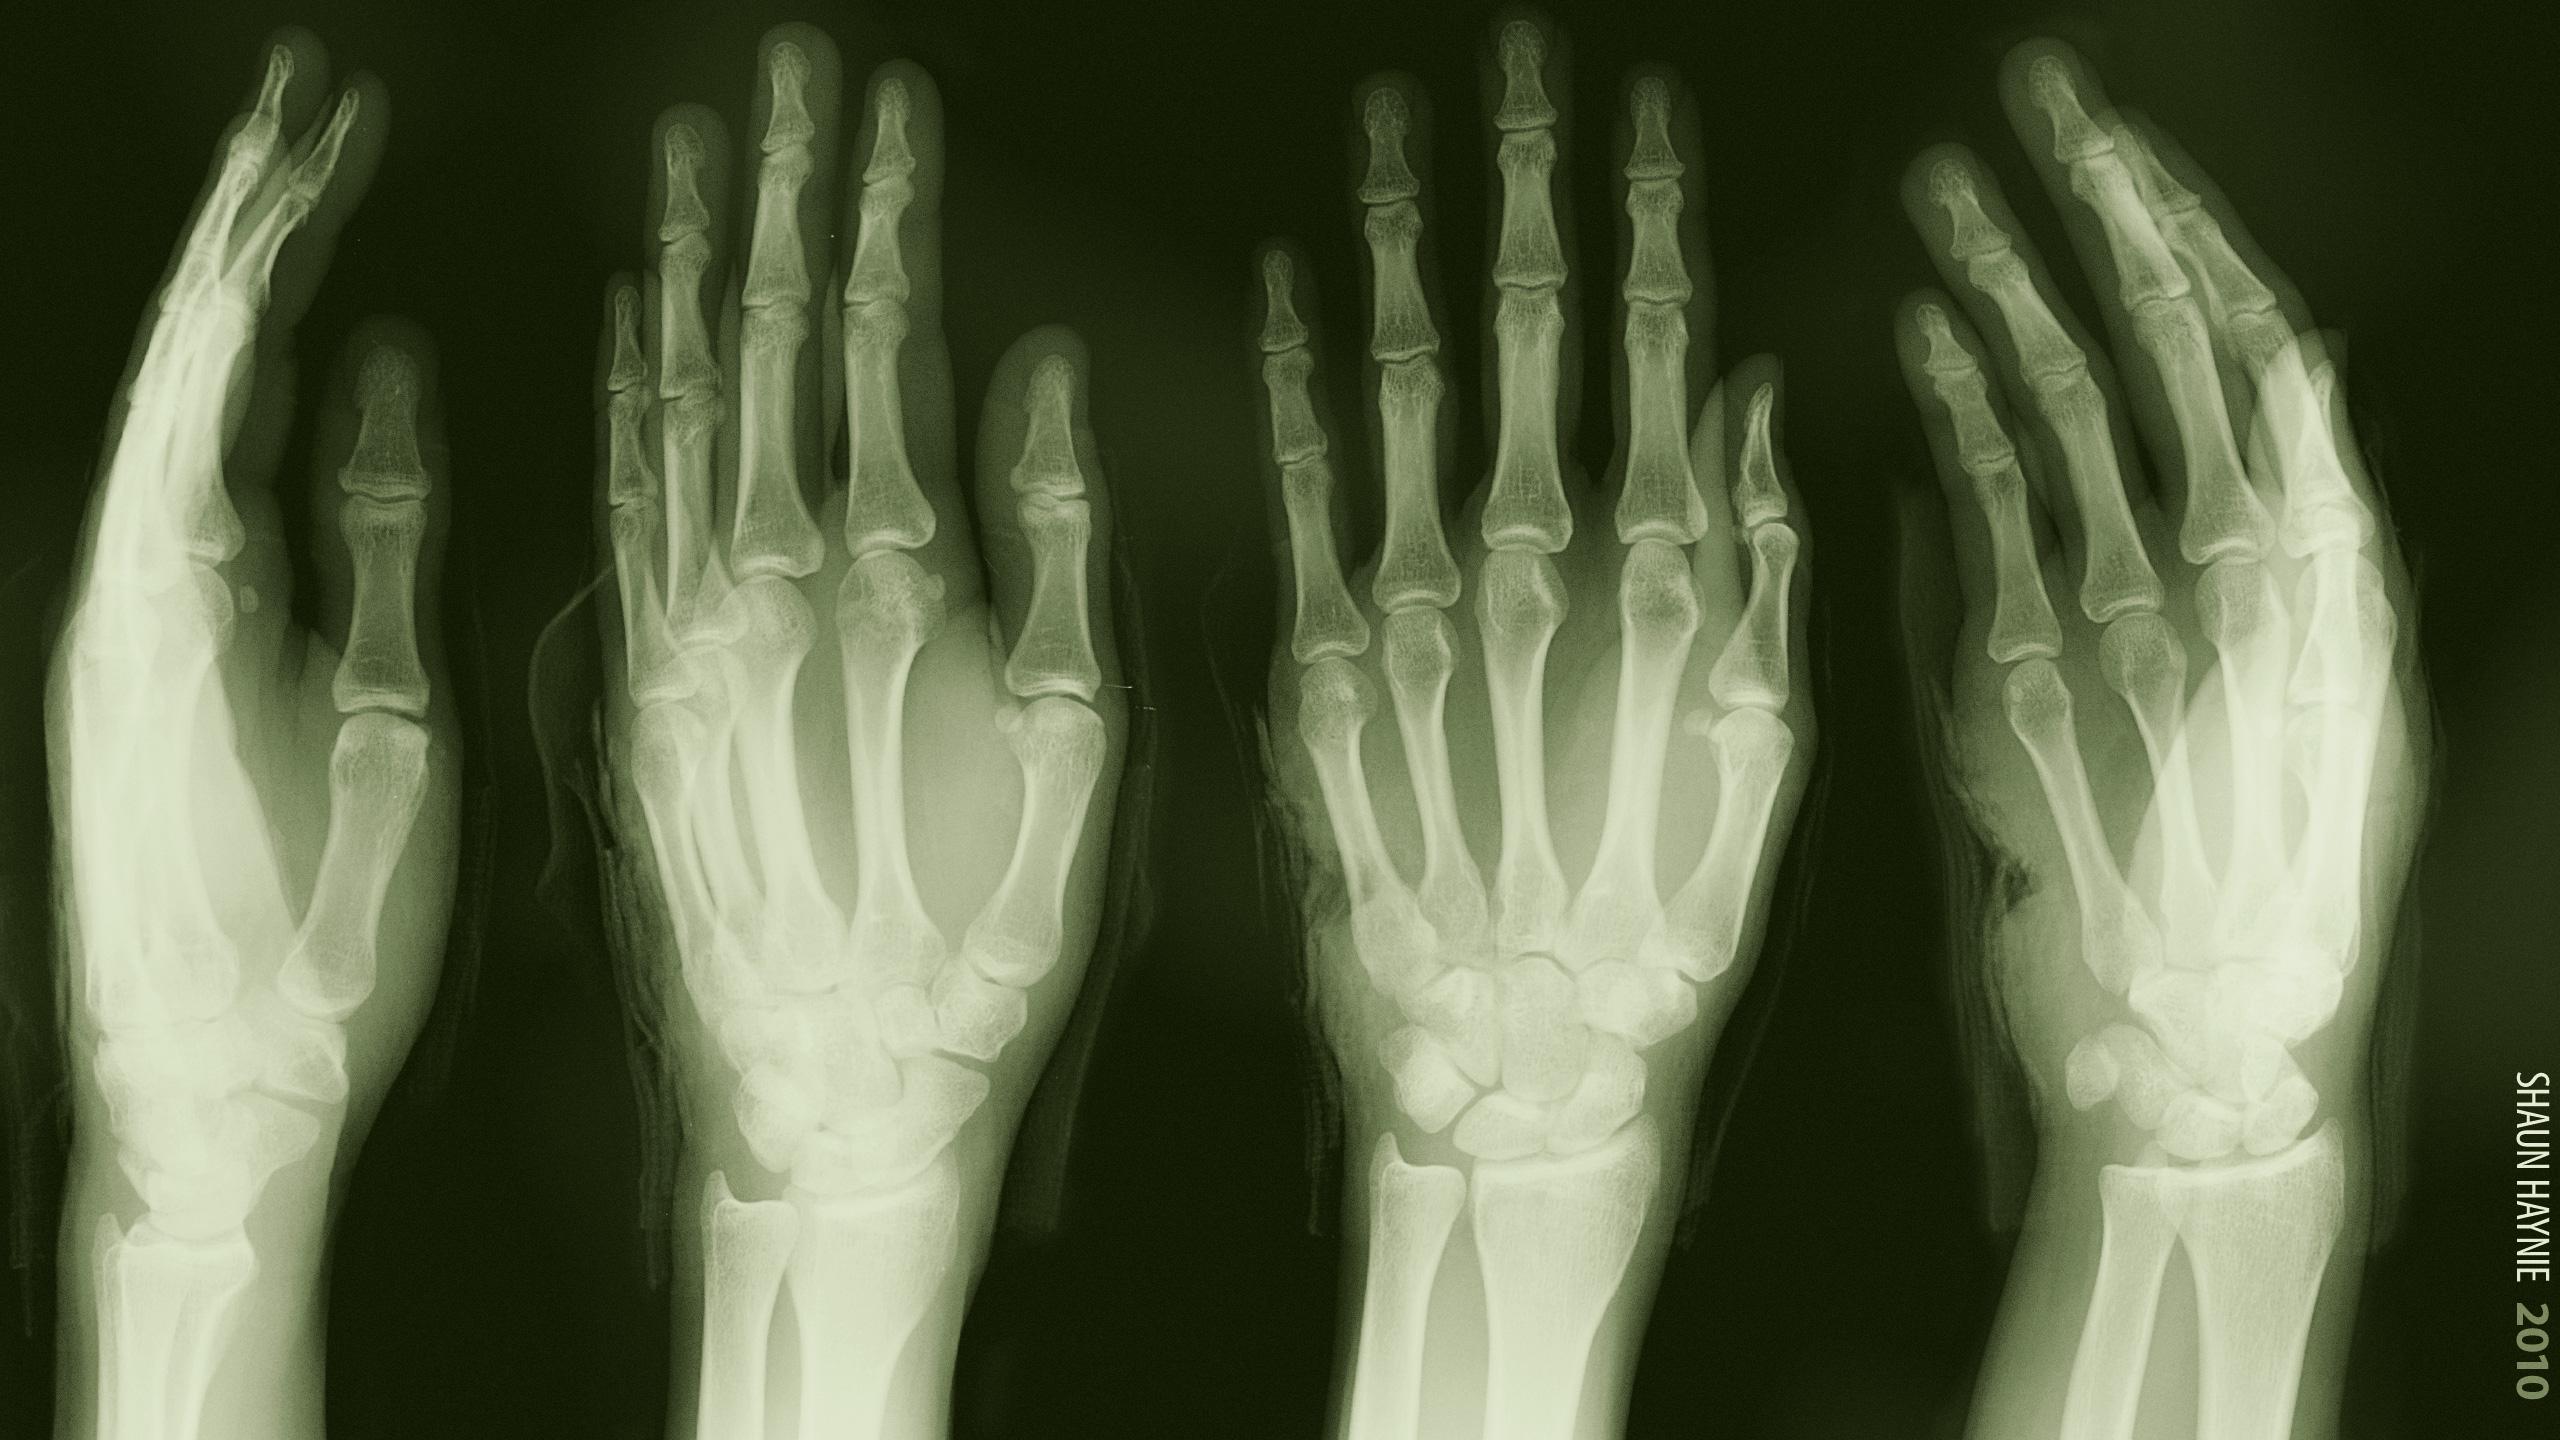 Dark   Skeleton Medical Green Hand X ray Wallpaper 2560x1440